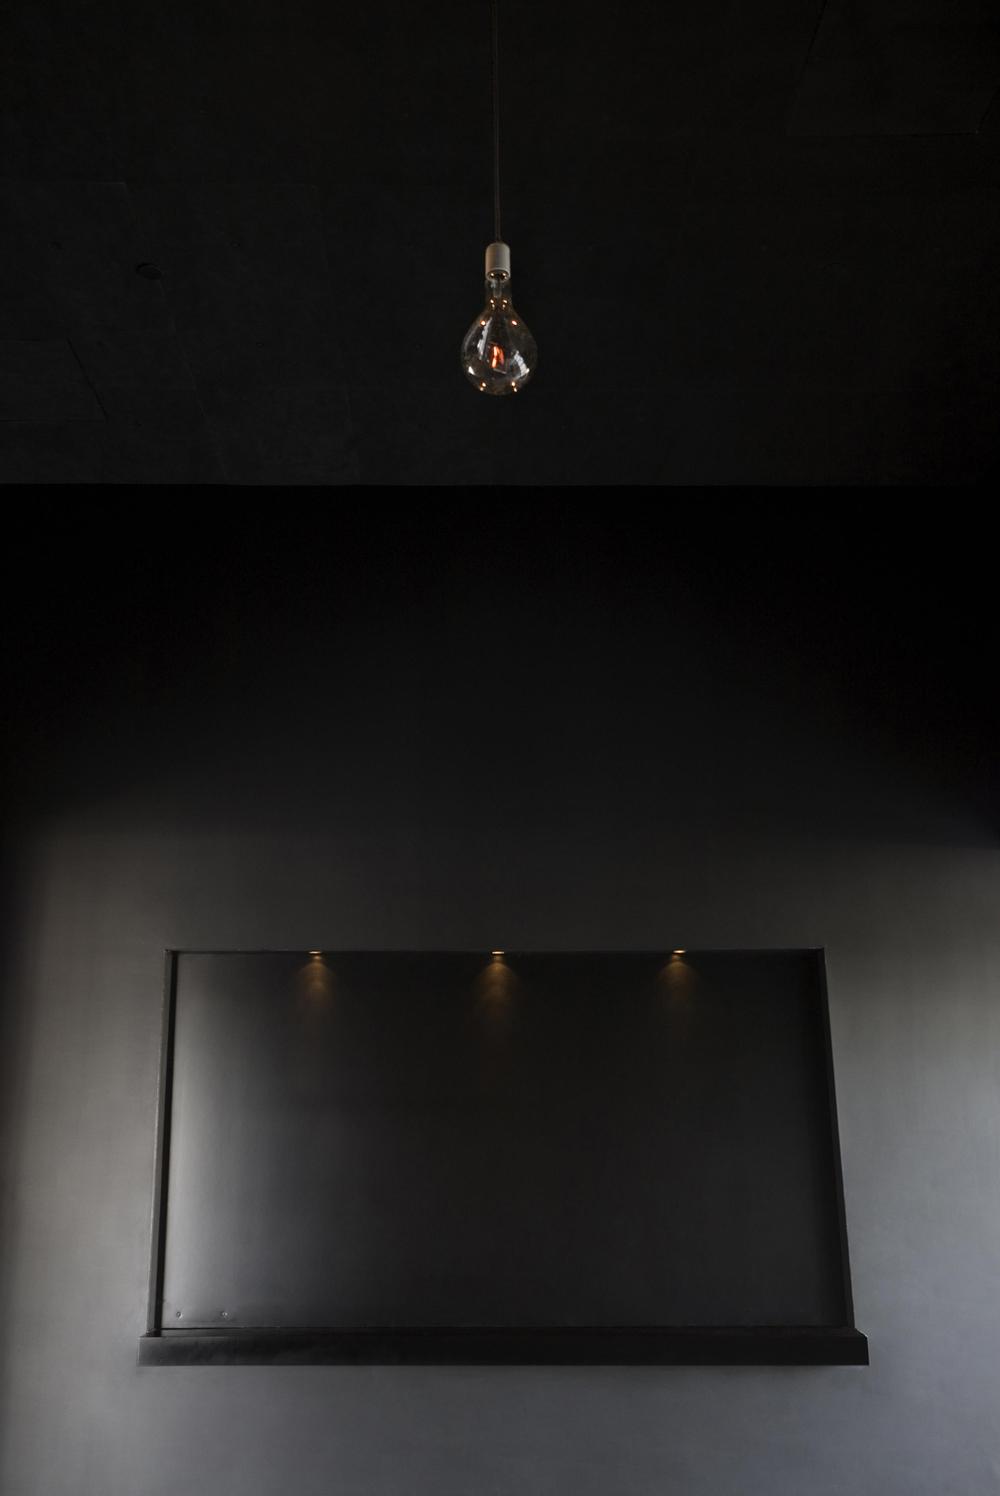 07 Salle de spectacle Dolbeau-Mistassini.jpg